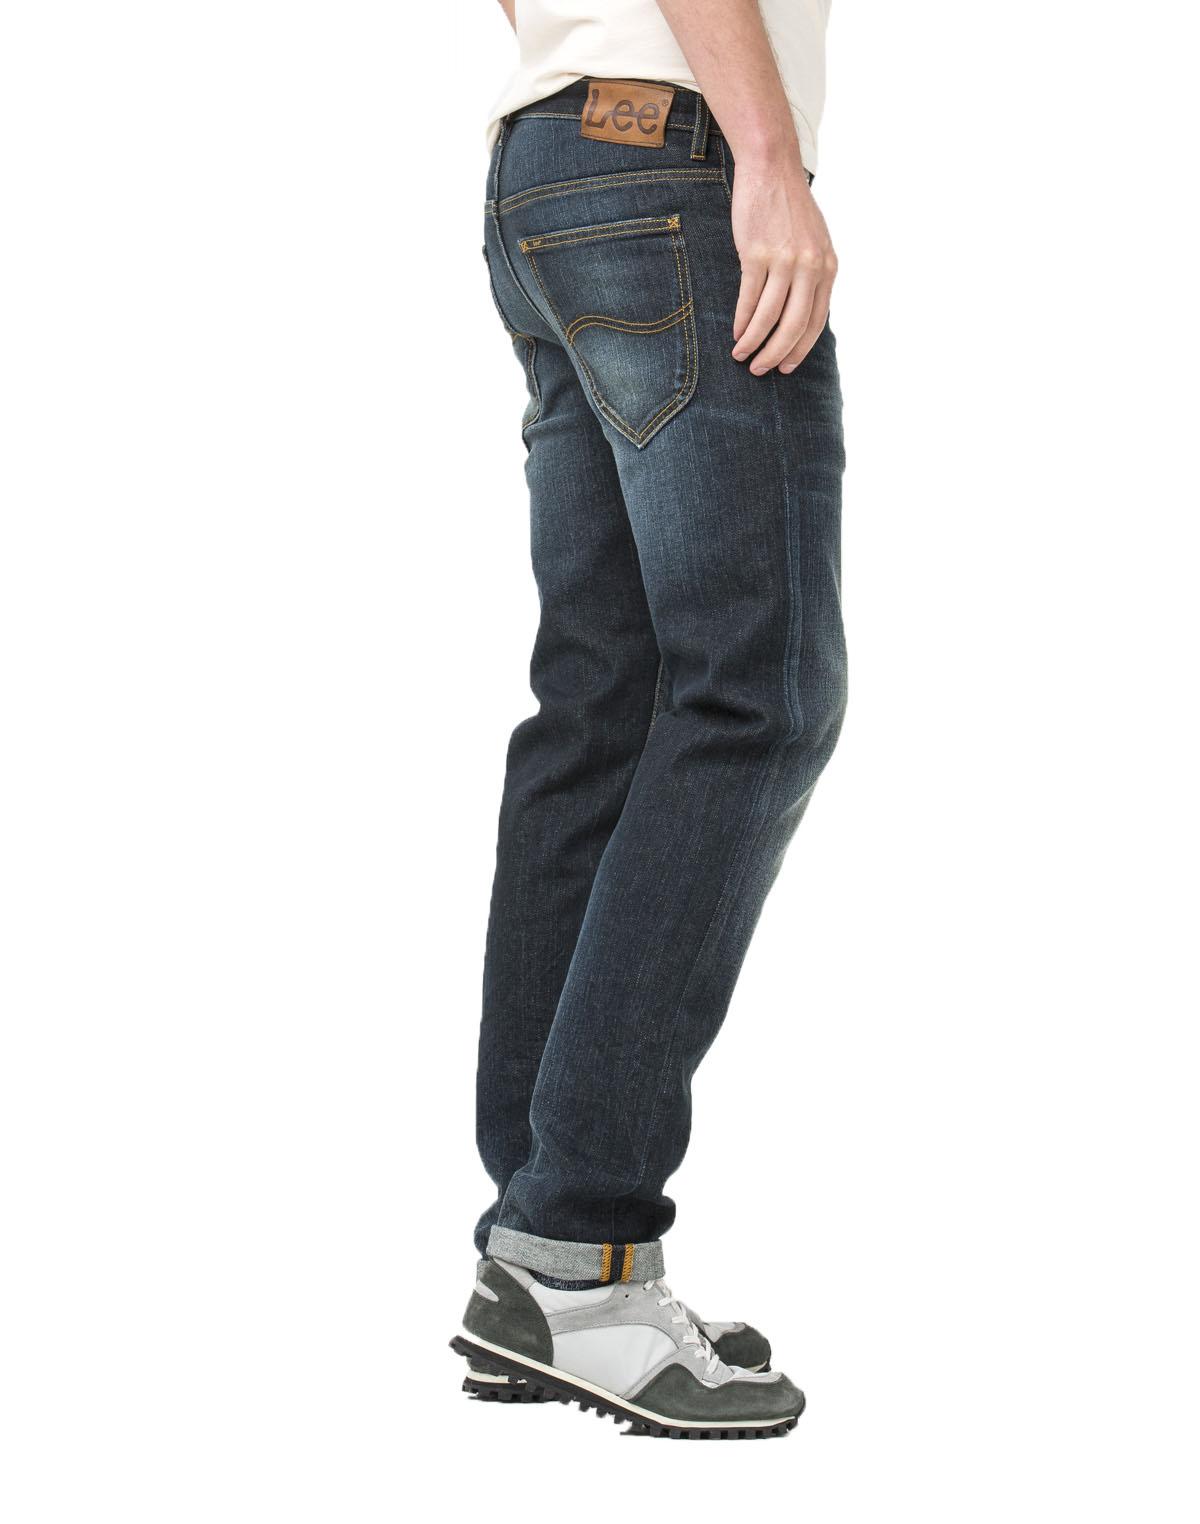 Lee Daren Slim Fit Tapered Jeans Mens Vintage Green Glint Straight Faded Denim